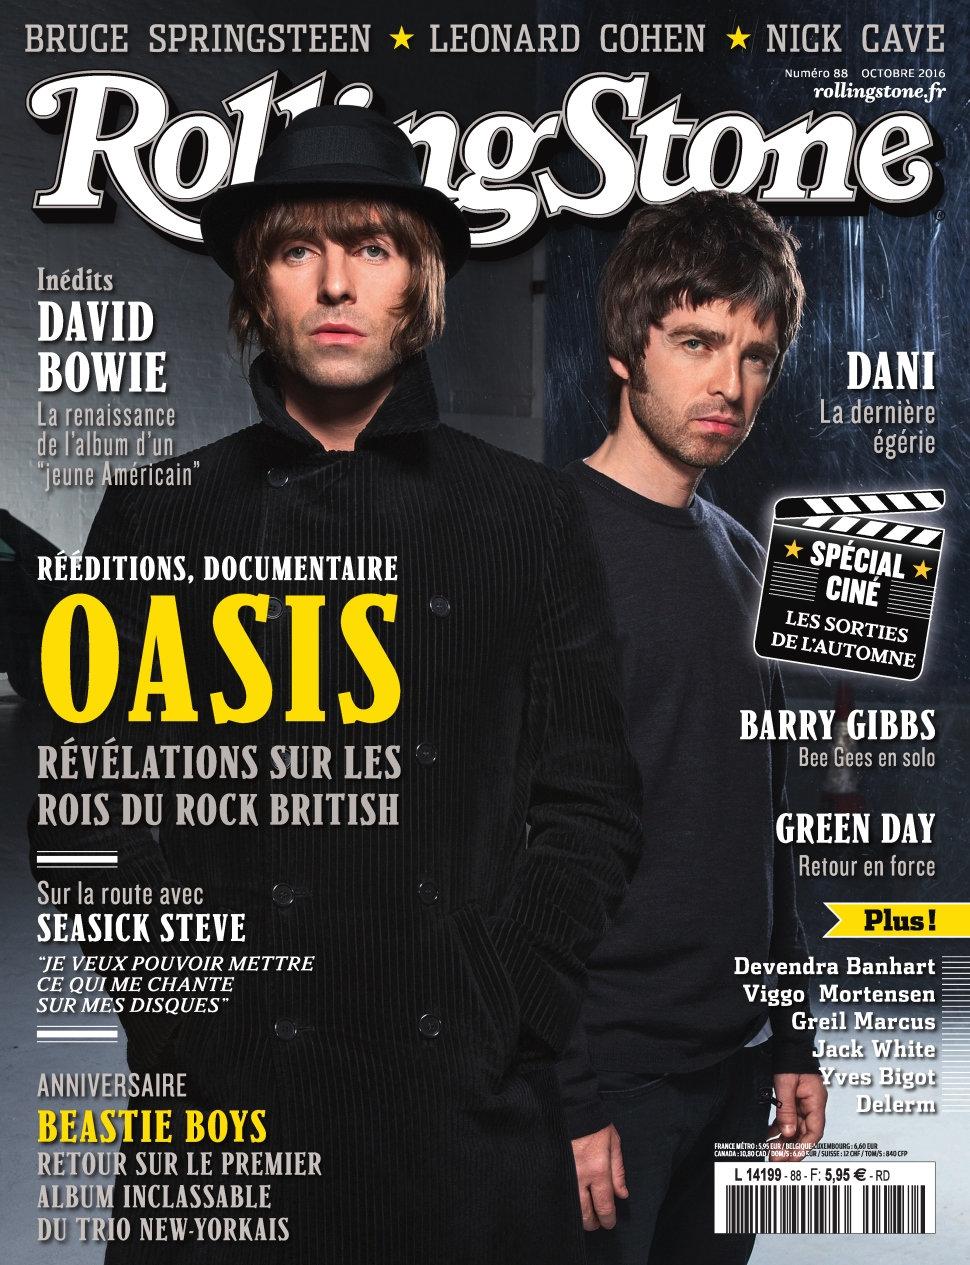 Rolling Stone N°88 - Octobre 2016